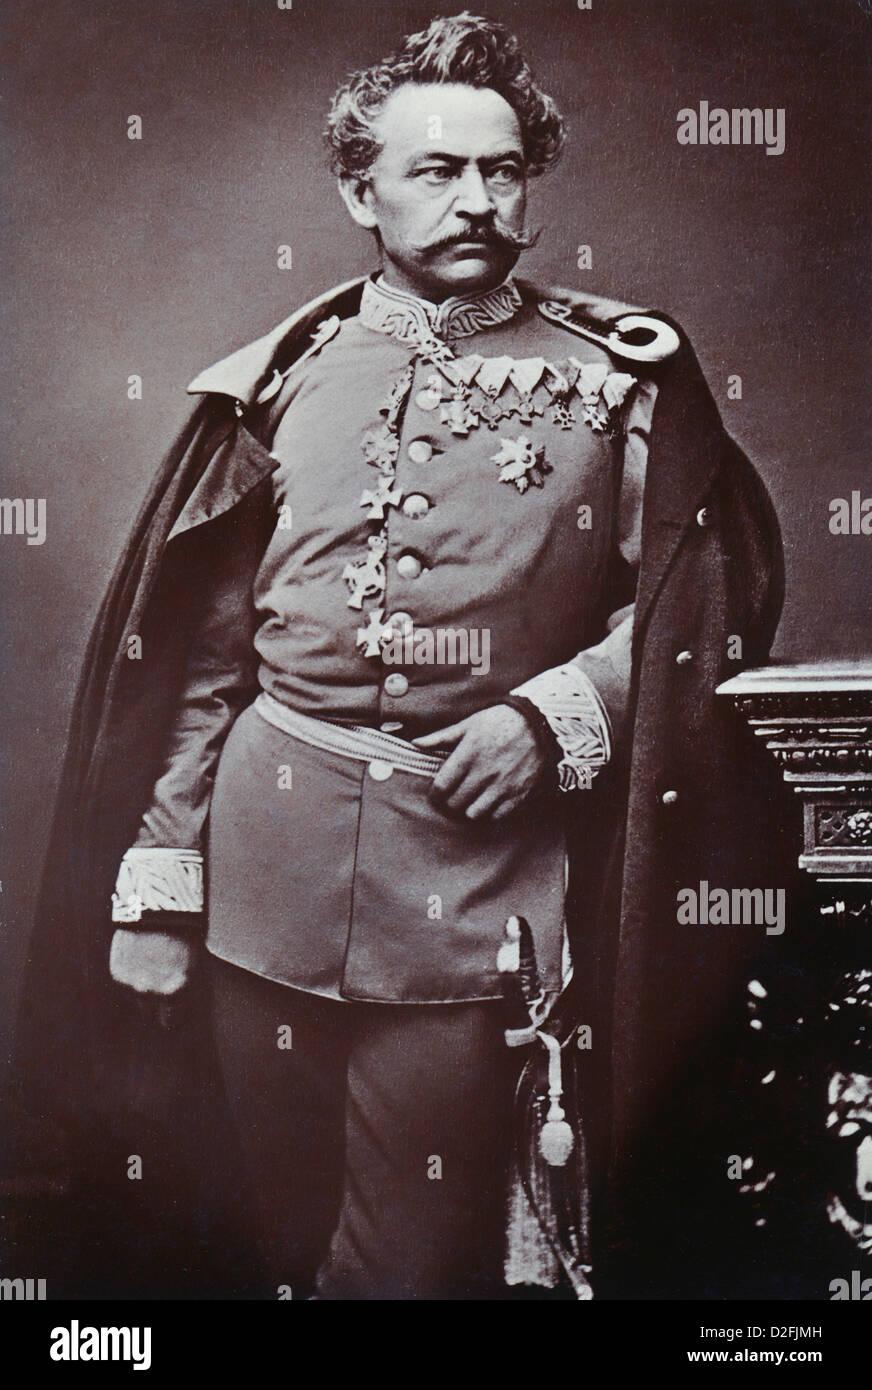 Johann Baptist Ritter von Stephan, 1808-1875, General of the Royal Bavarian Army, Franco-Prussian War 1870-1871 - Stock Image